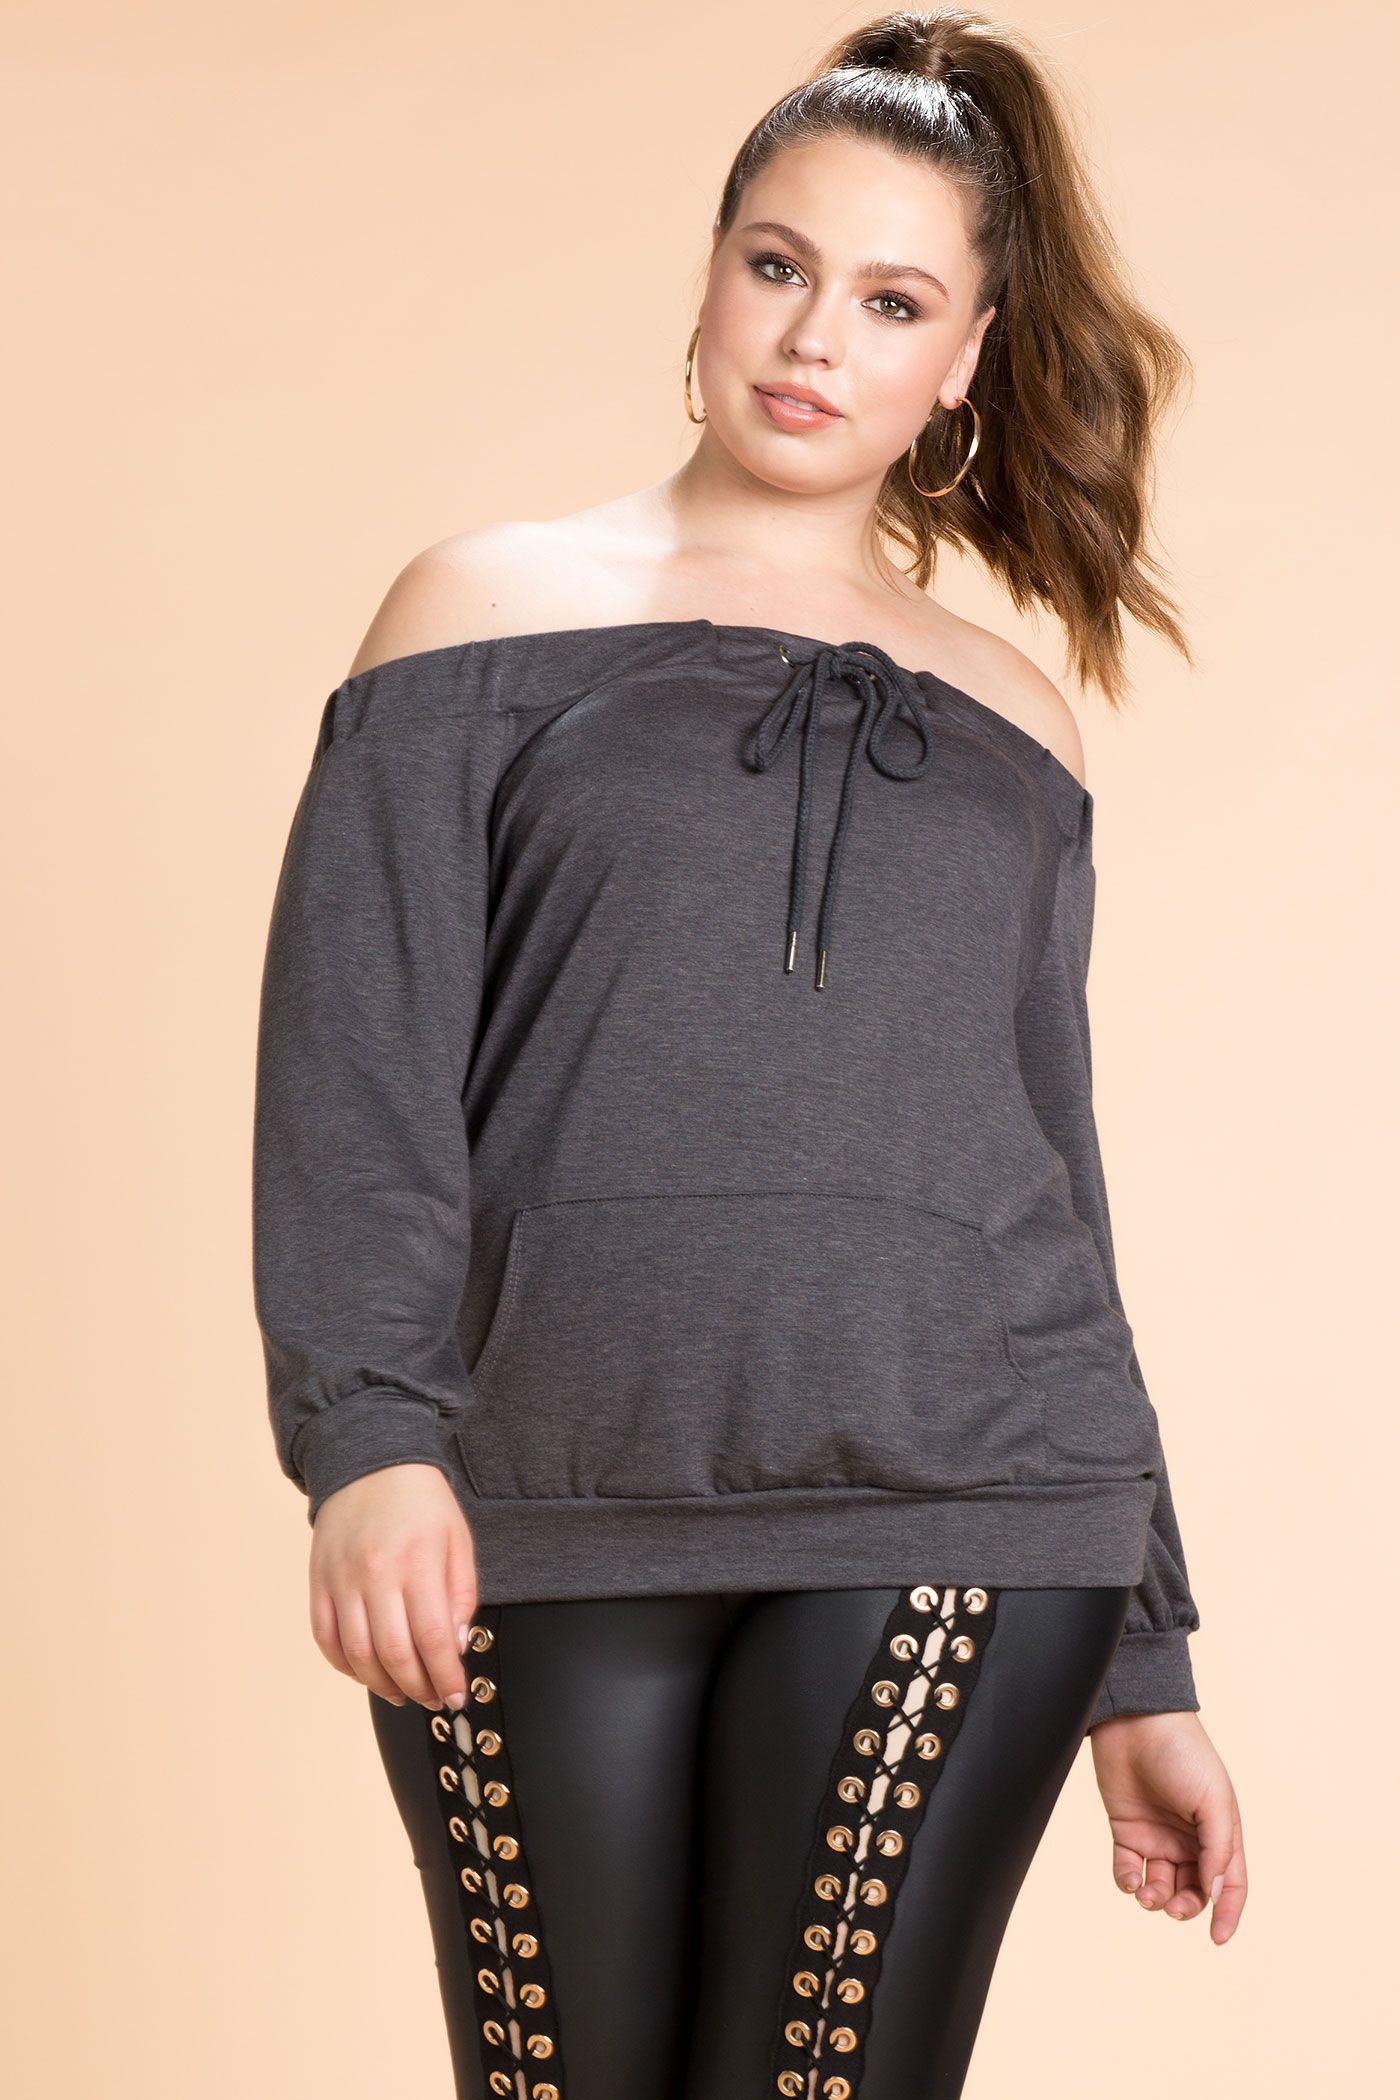 cba59e79fdbac Women s Plus Size Sweatshirts